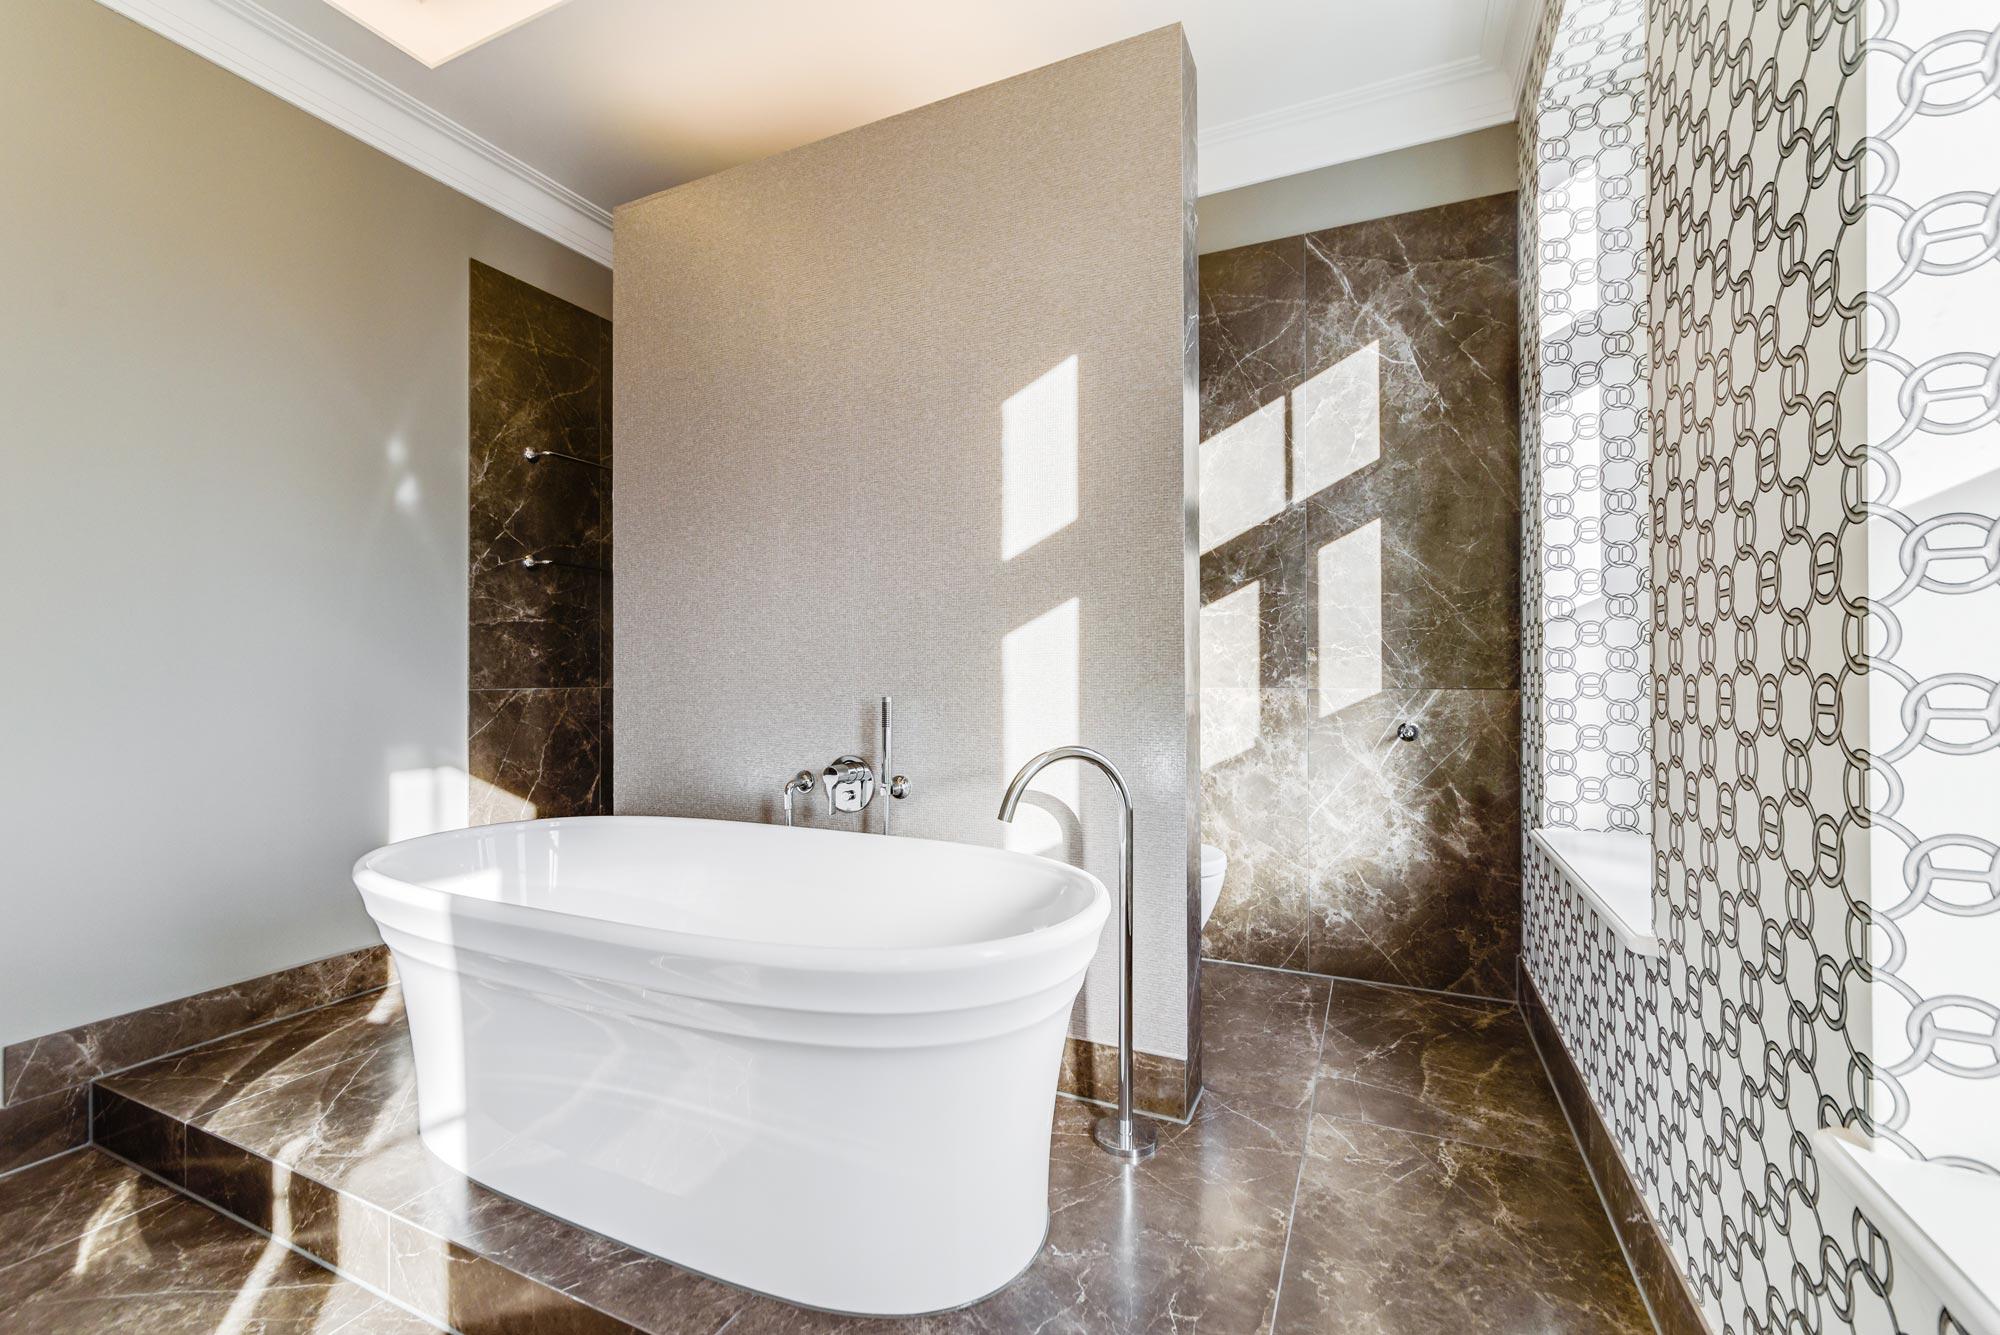 A bathroom created by Eberhard Mueller.